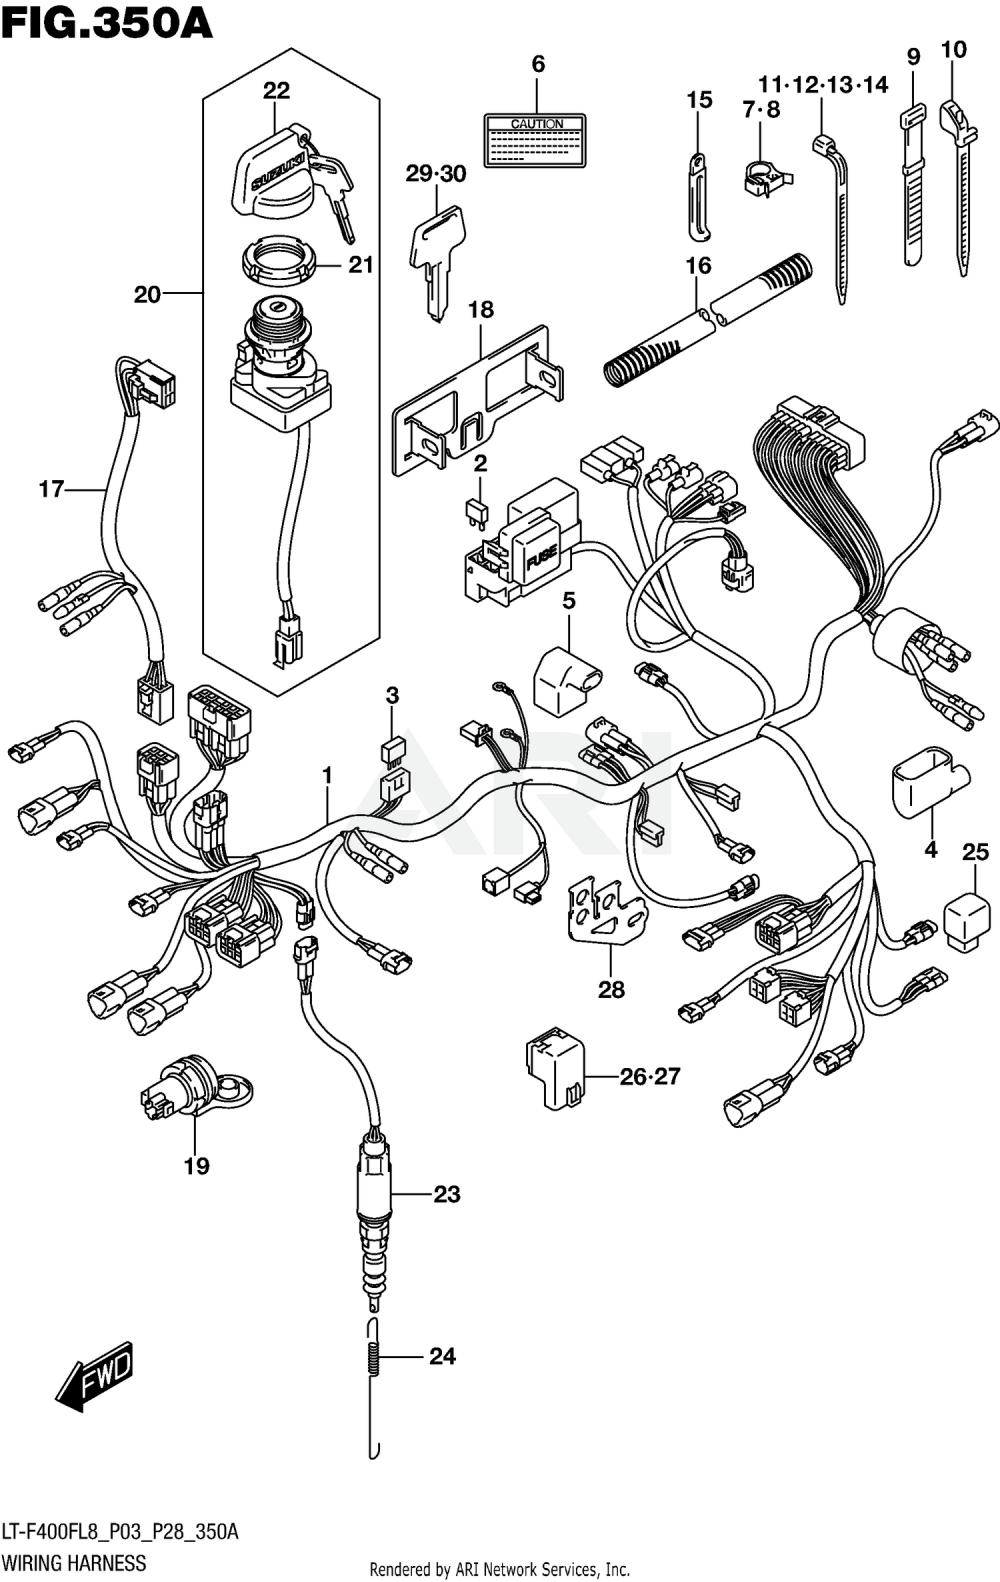 medium resolution of suzuki king quad wiring harness wiring diagram database 2006 suzuki king quad 700 wiring harness 2018